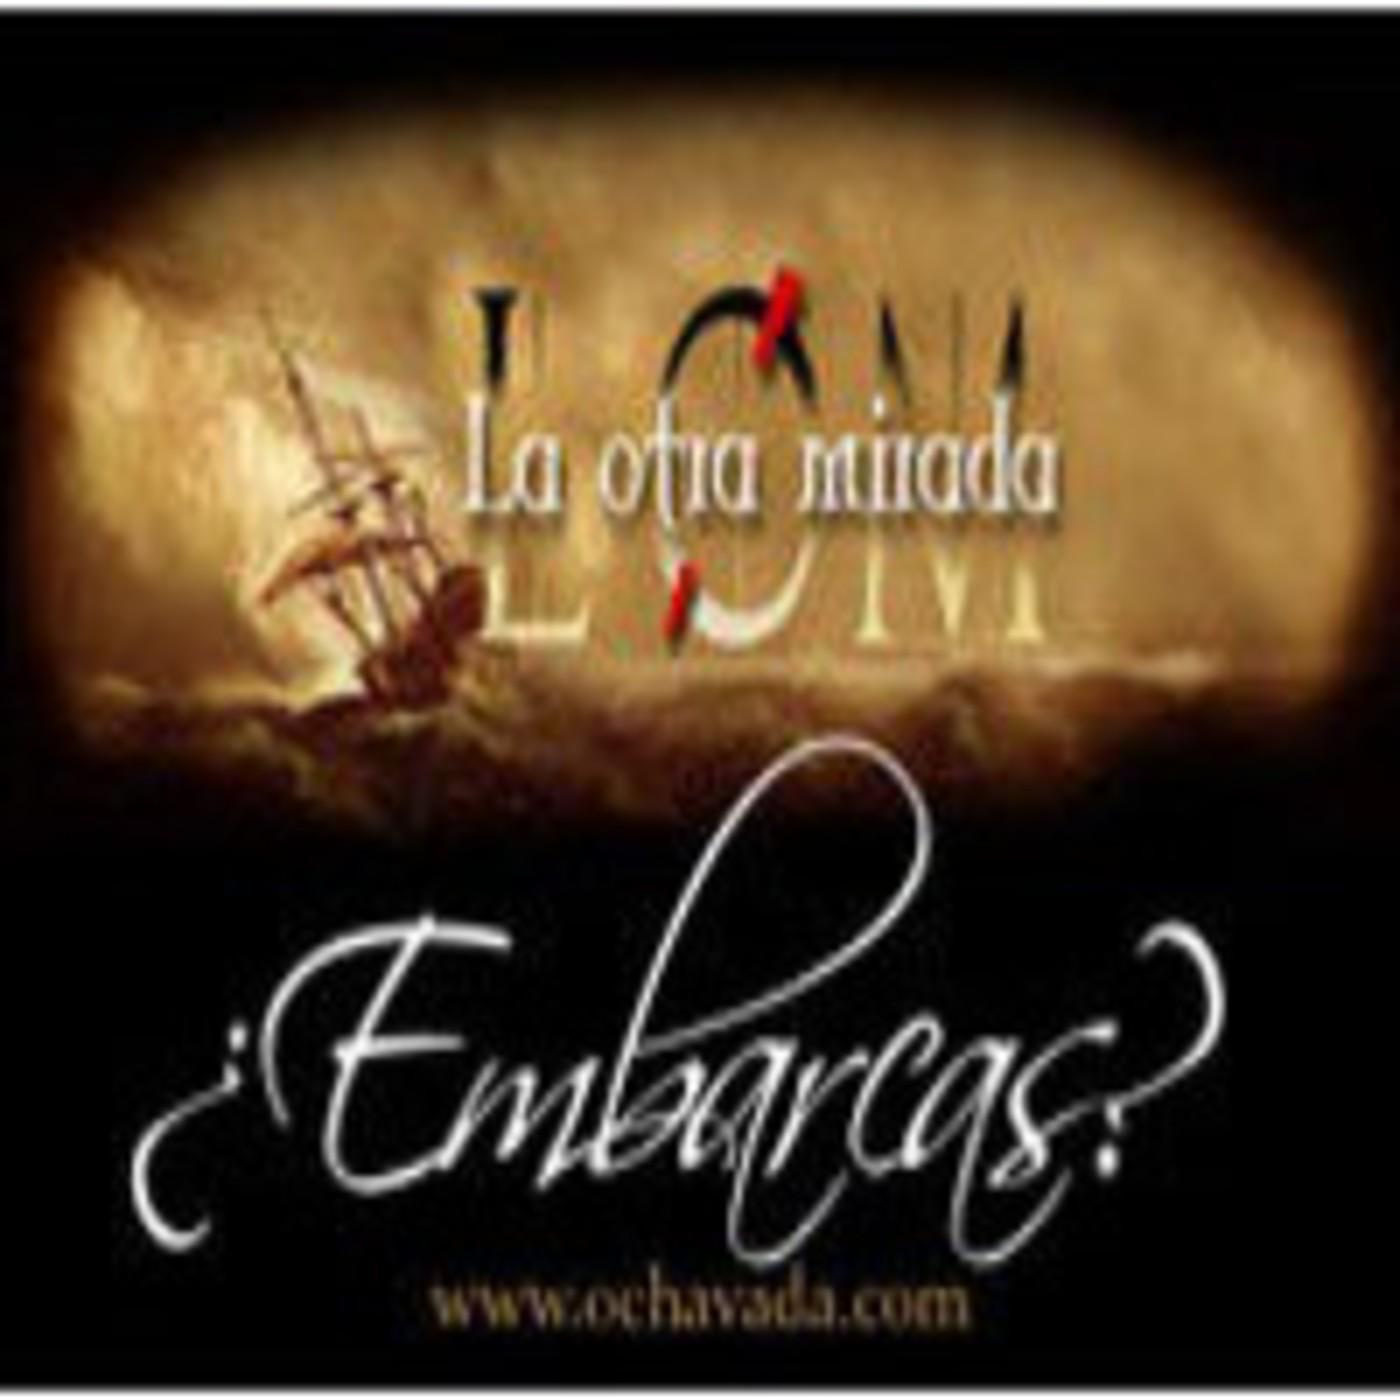 Asesinos en serie - La Otra Mirada - 06-11-2009